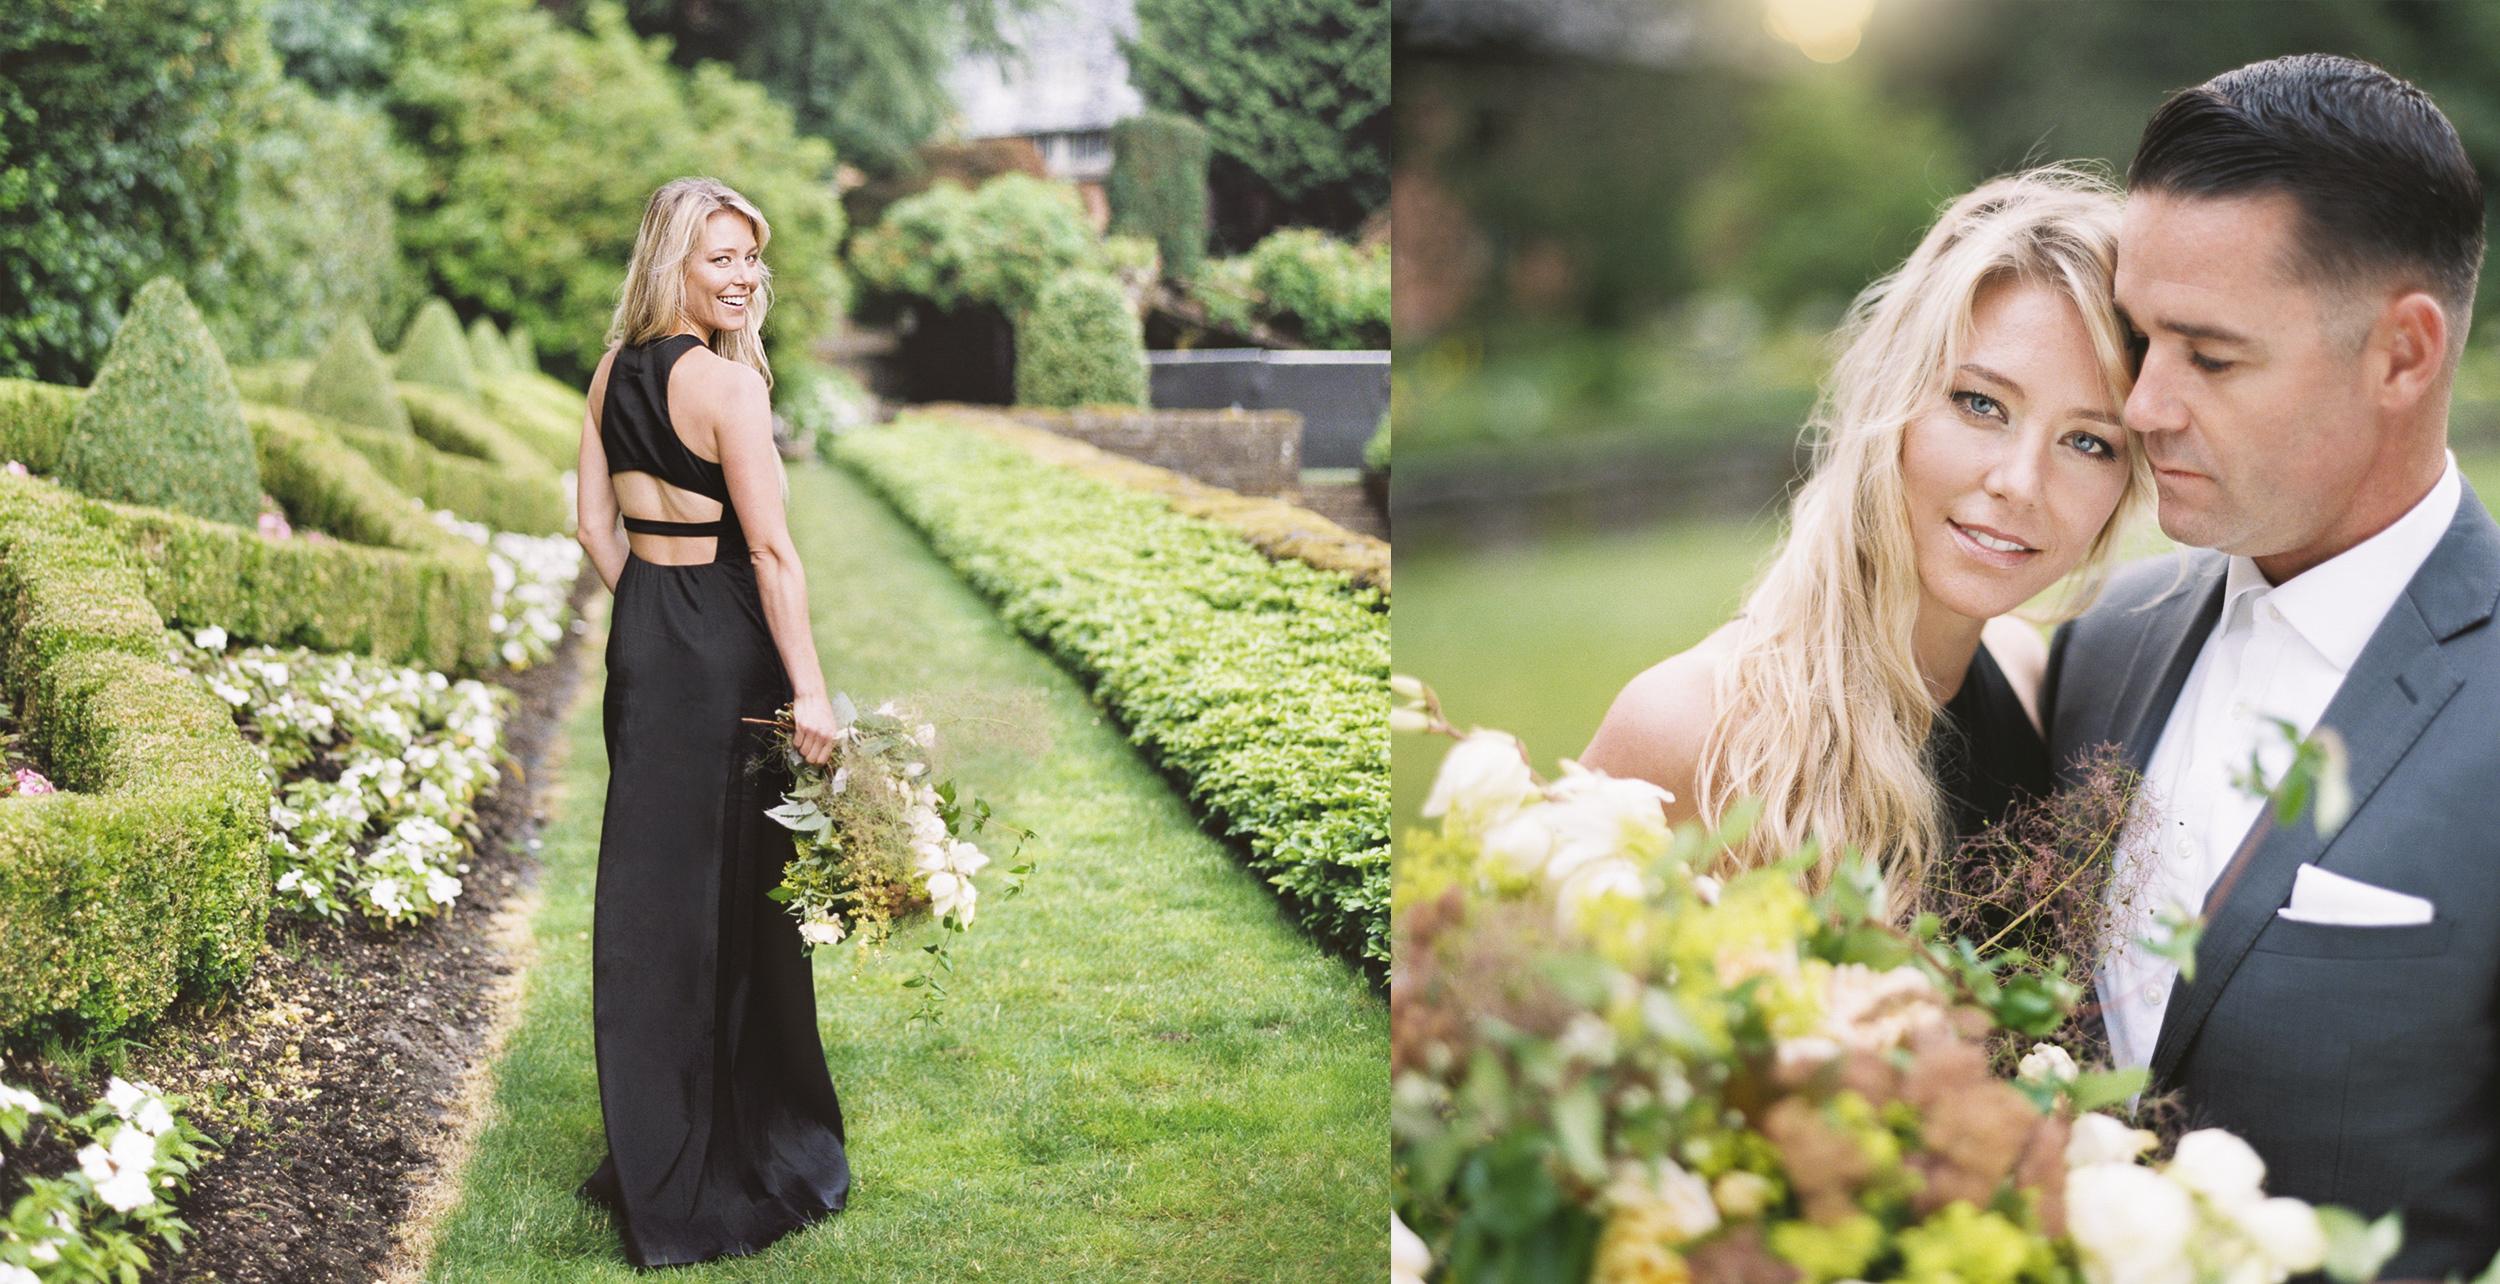 08_best+wedding+photographer+videographer+luxury+weddings+elopements_.jpg